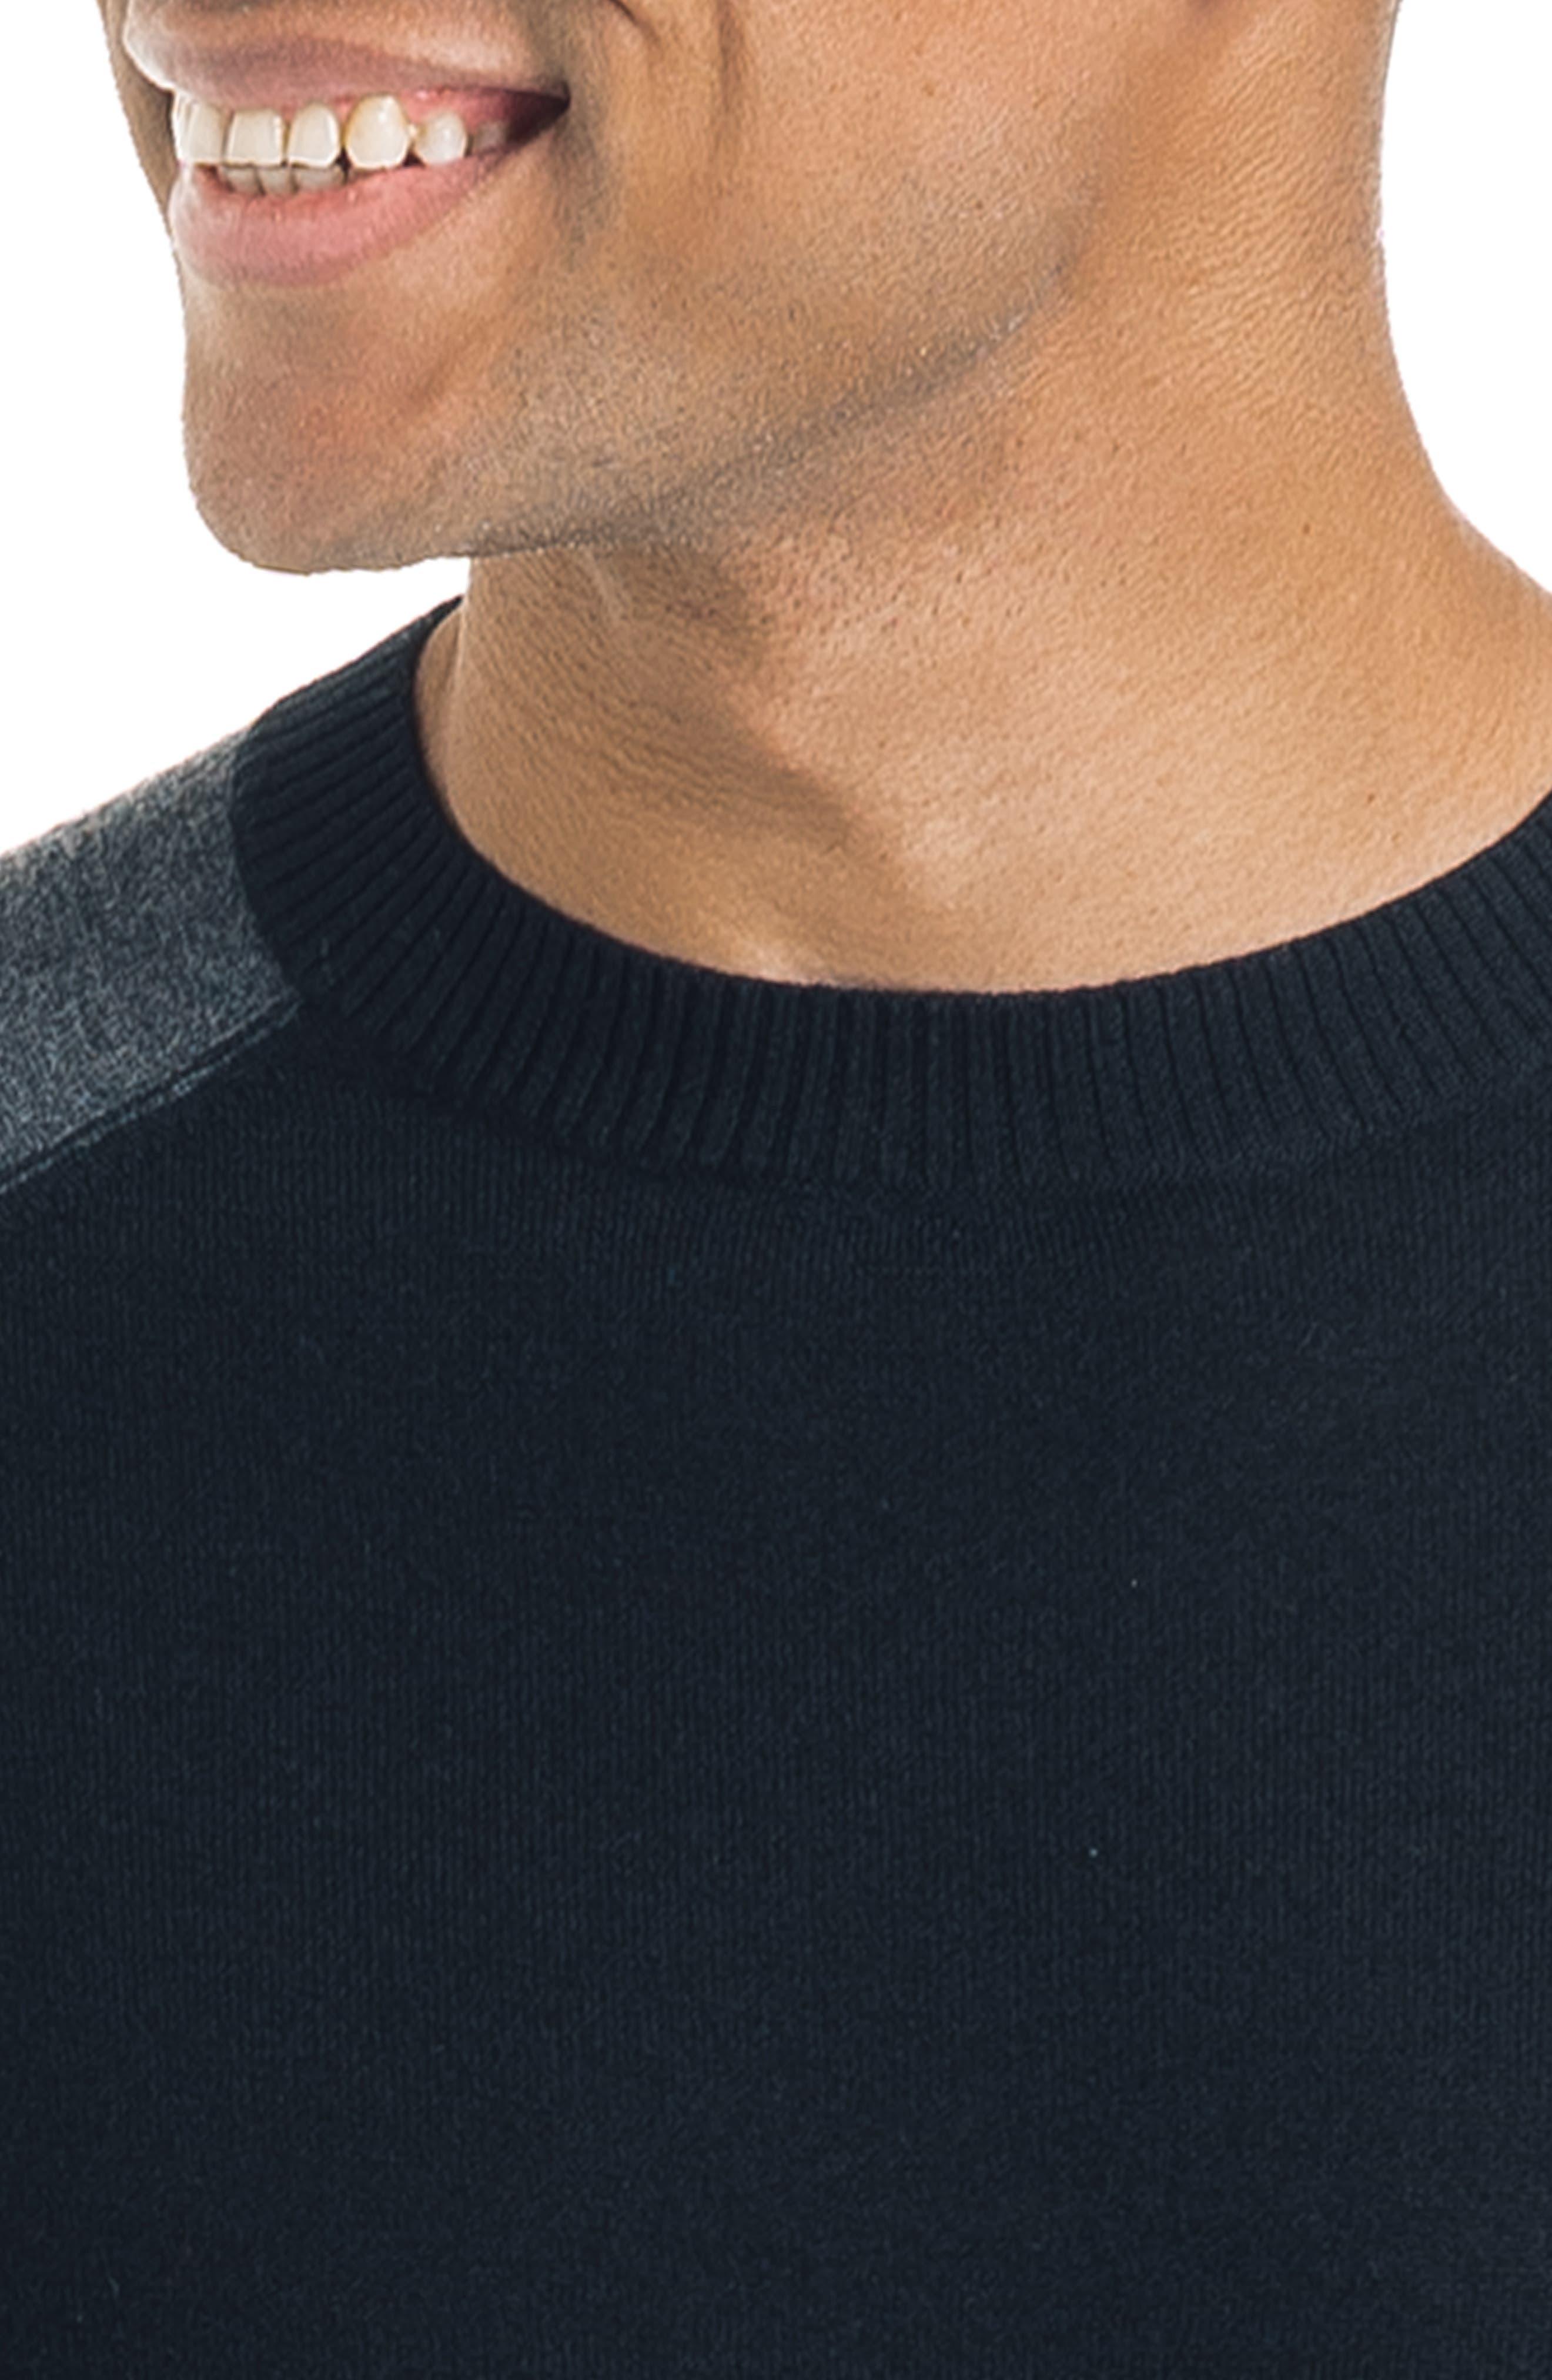 Mix Modern Slim Fit Wool Sweater,                             Alternate thumbnail 4, color,                             BLACK